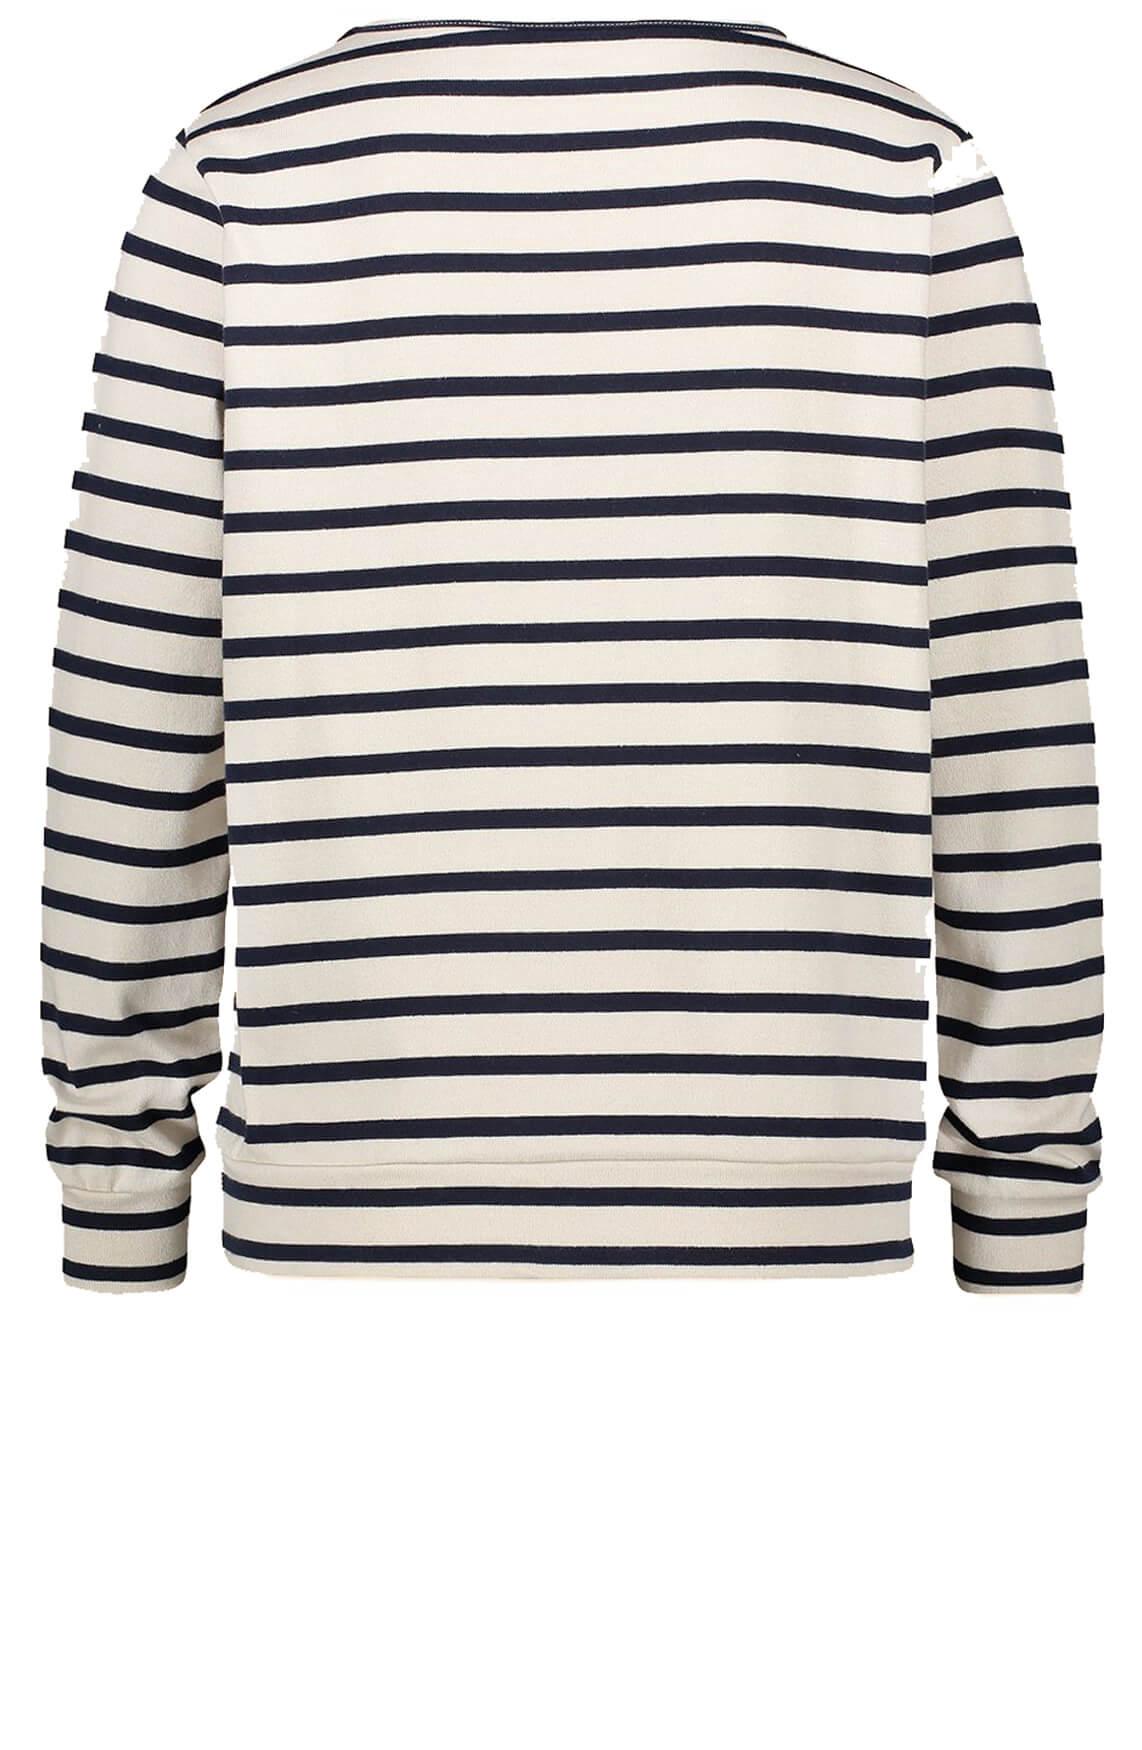 Penn & Ink Dames Gestreept sweatshirt Blauw